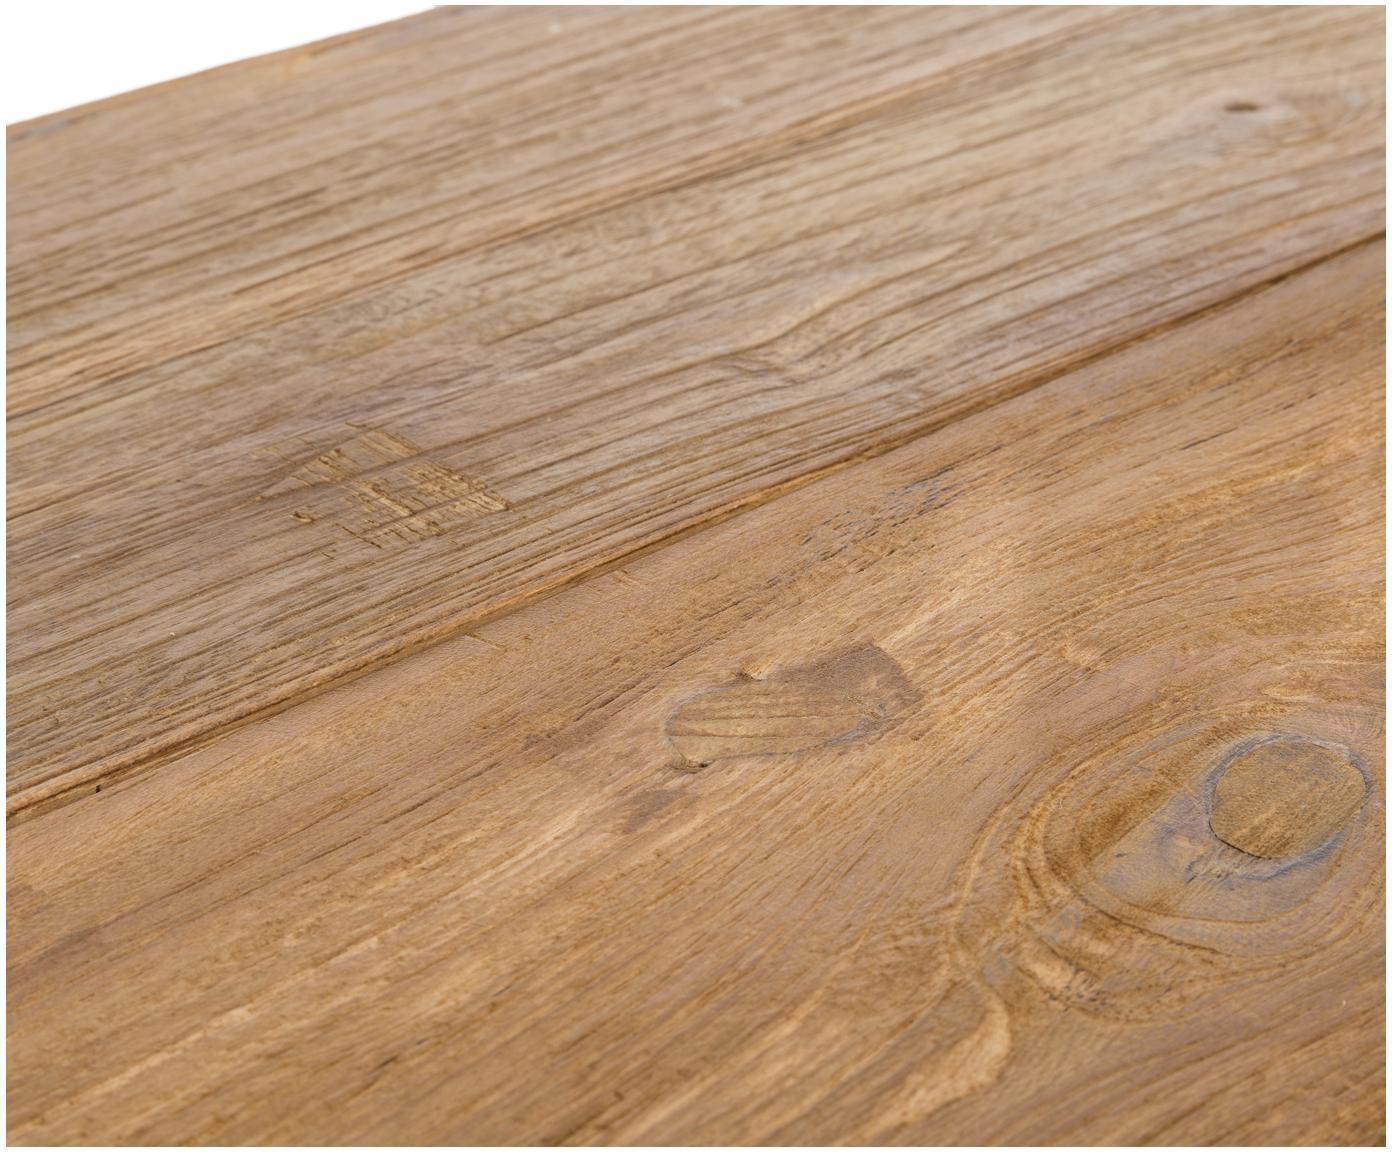 Massivholz Esstisch Bois, Massives Teakholz, unbehandelt, Teak, B 180 x T 90 cm